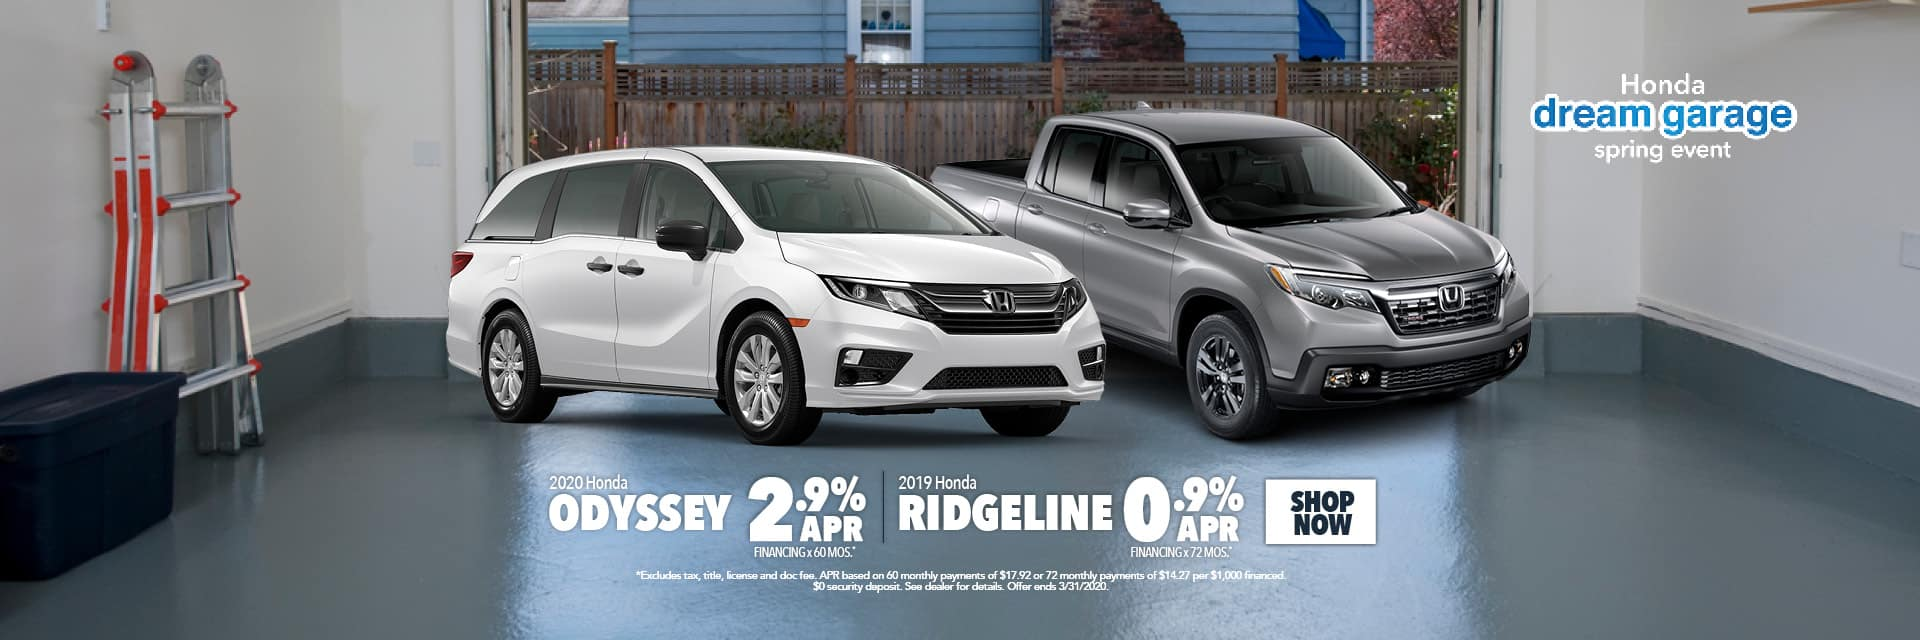 Honda_Odyssey_&_Ridgeline_Special_Offers